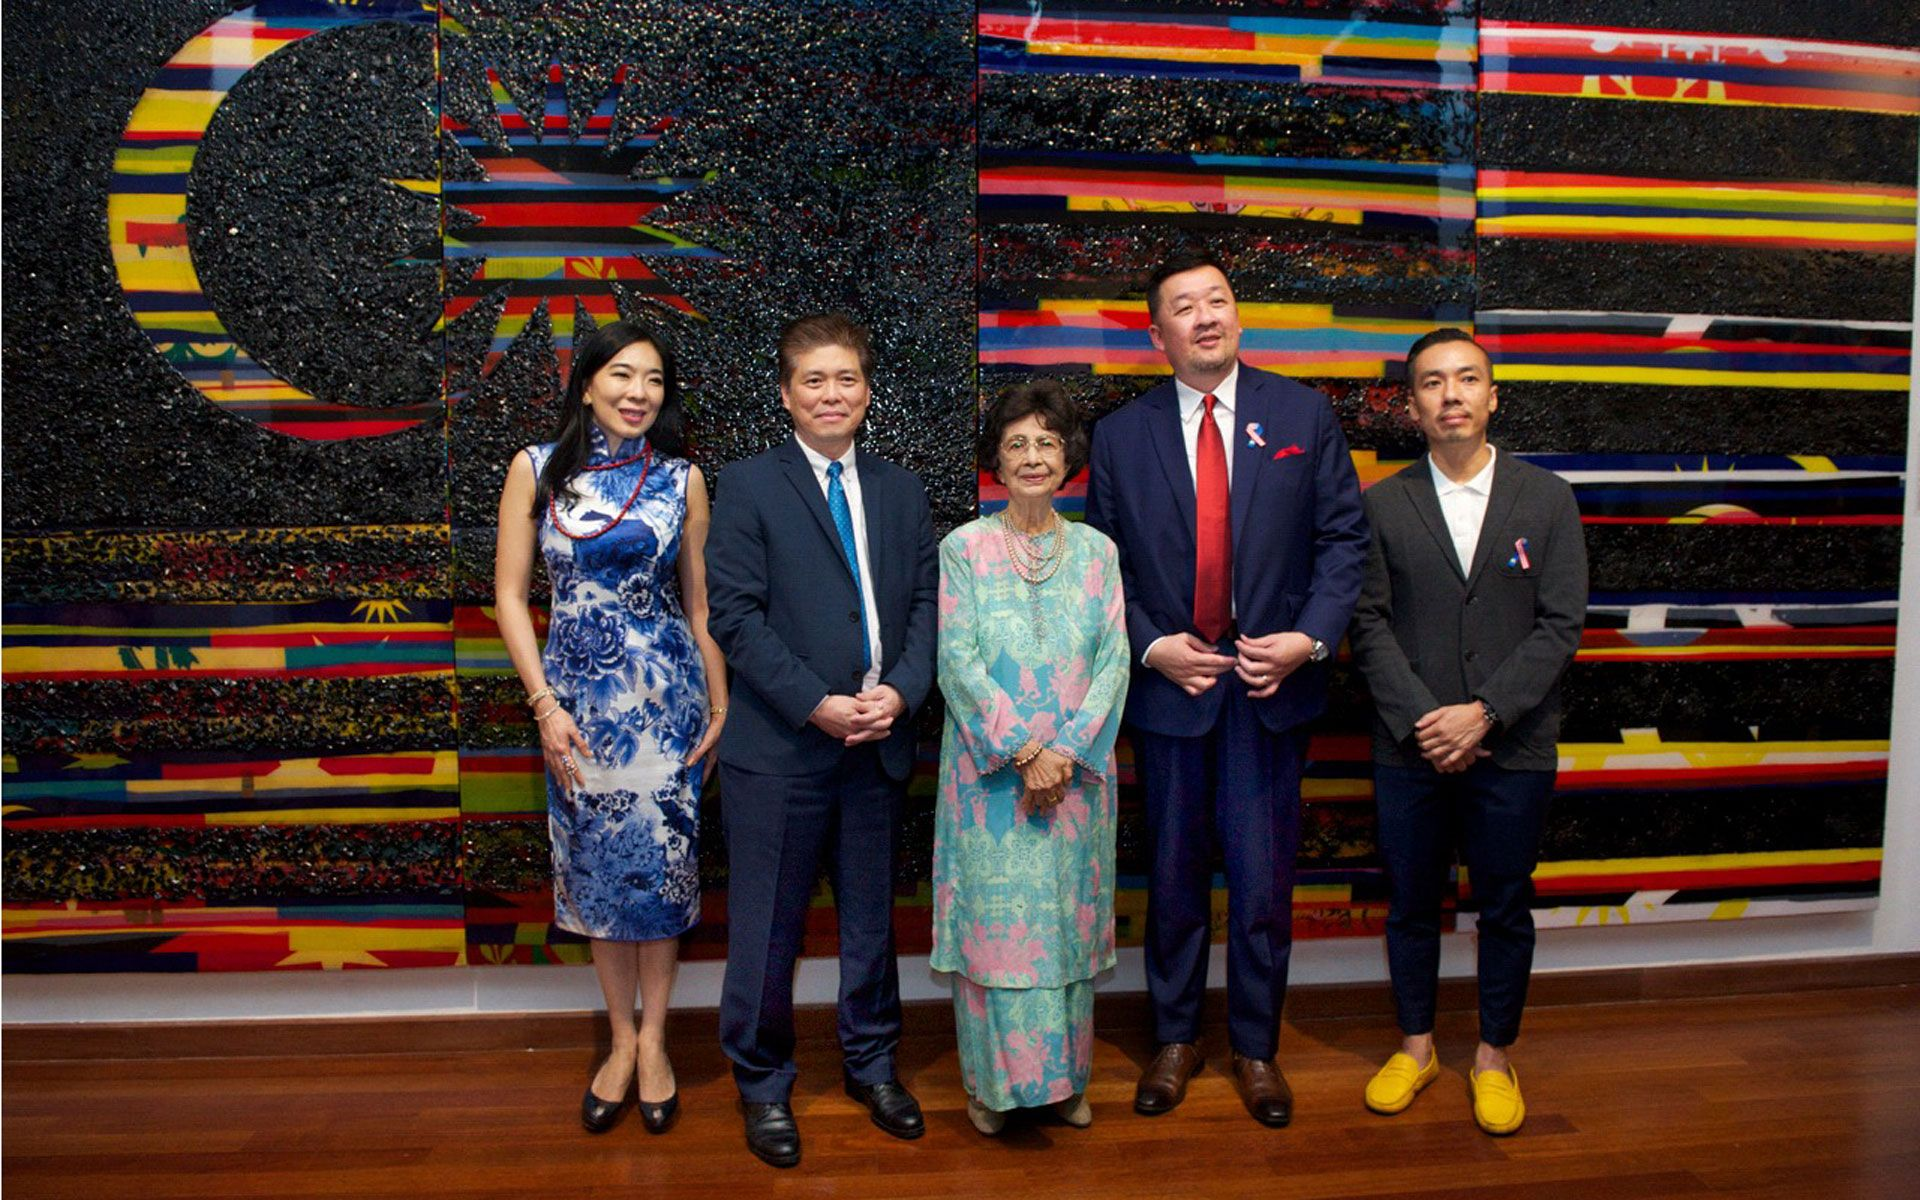 Lim Wei Ling, Ronnie Lim, Tun Dr Siti Hasmah, Lucas Chew and Ivan Lam